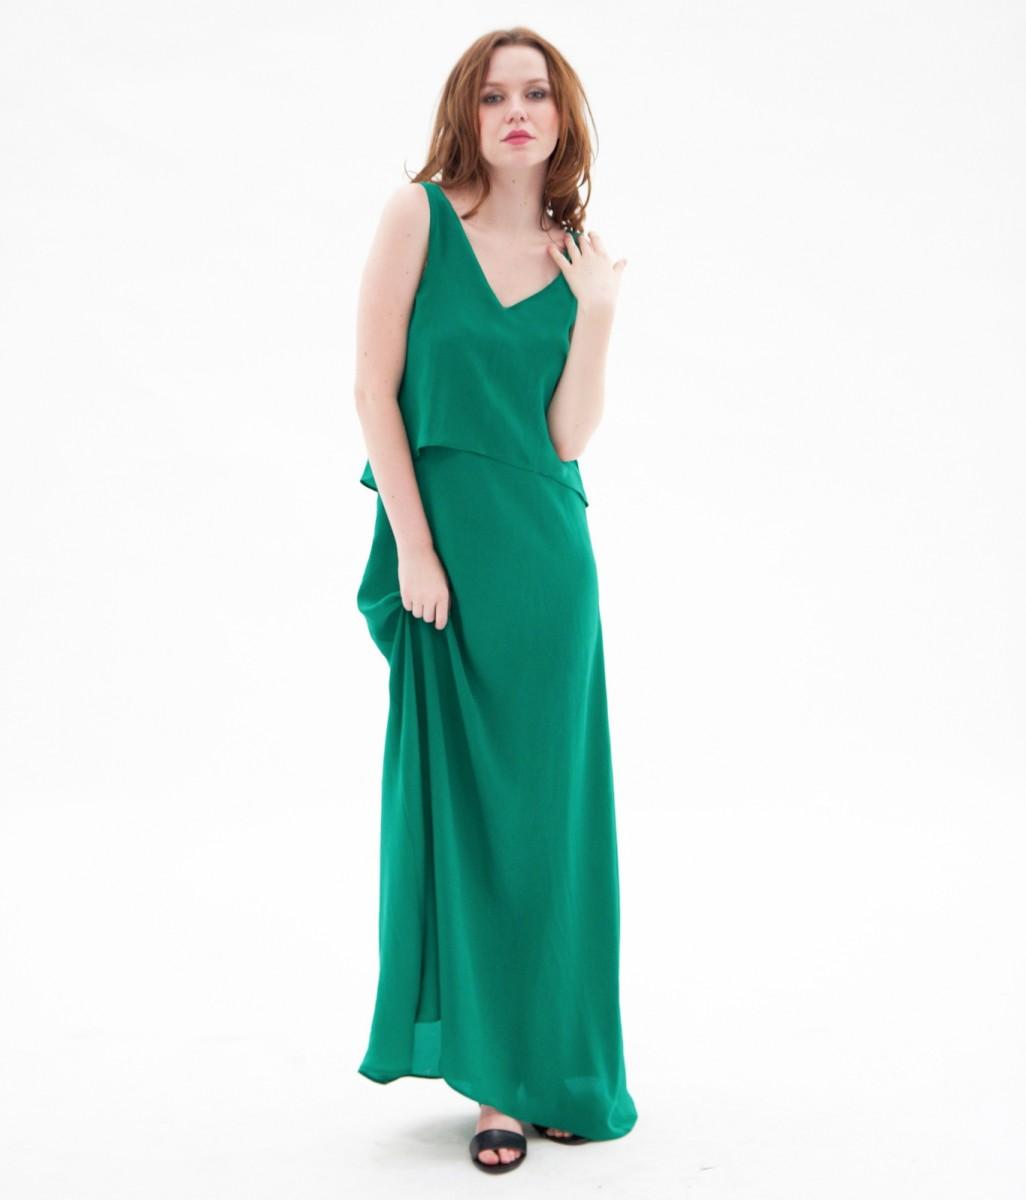 Maxi dress with flats